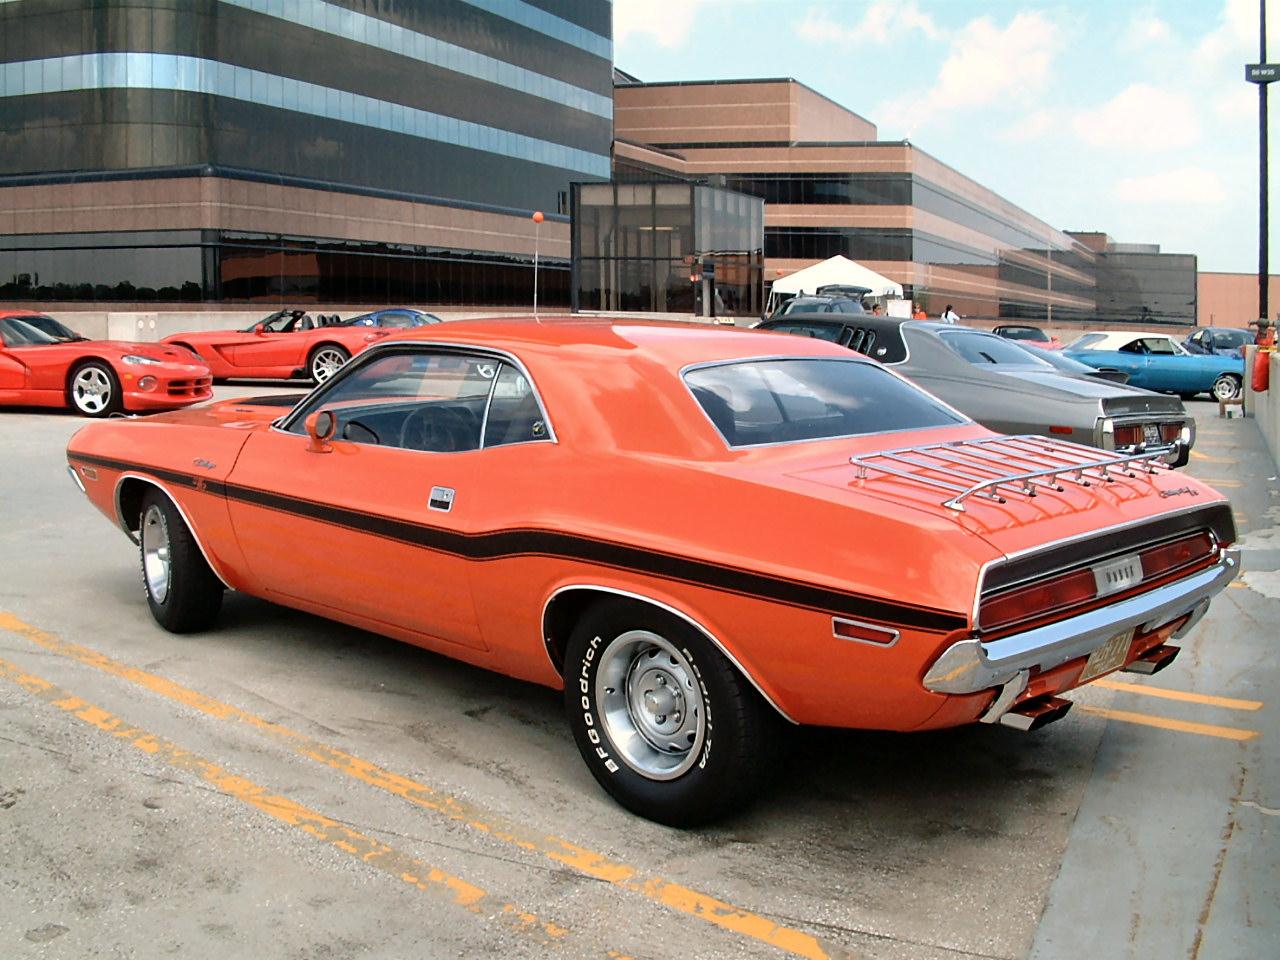 Stunning 1970 Dodge Challenger 1280 x 960 · 282 kB · jpeg